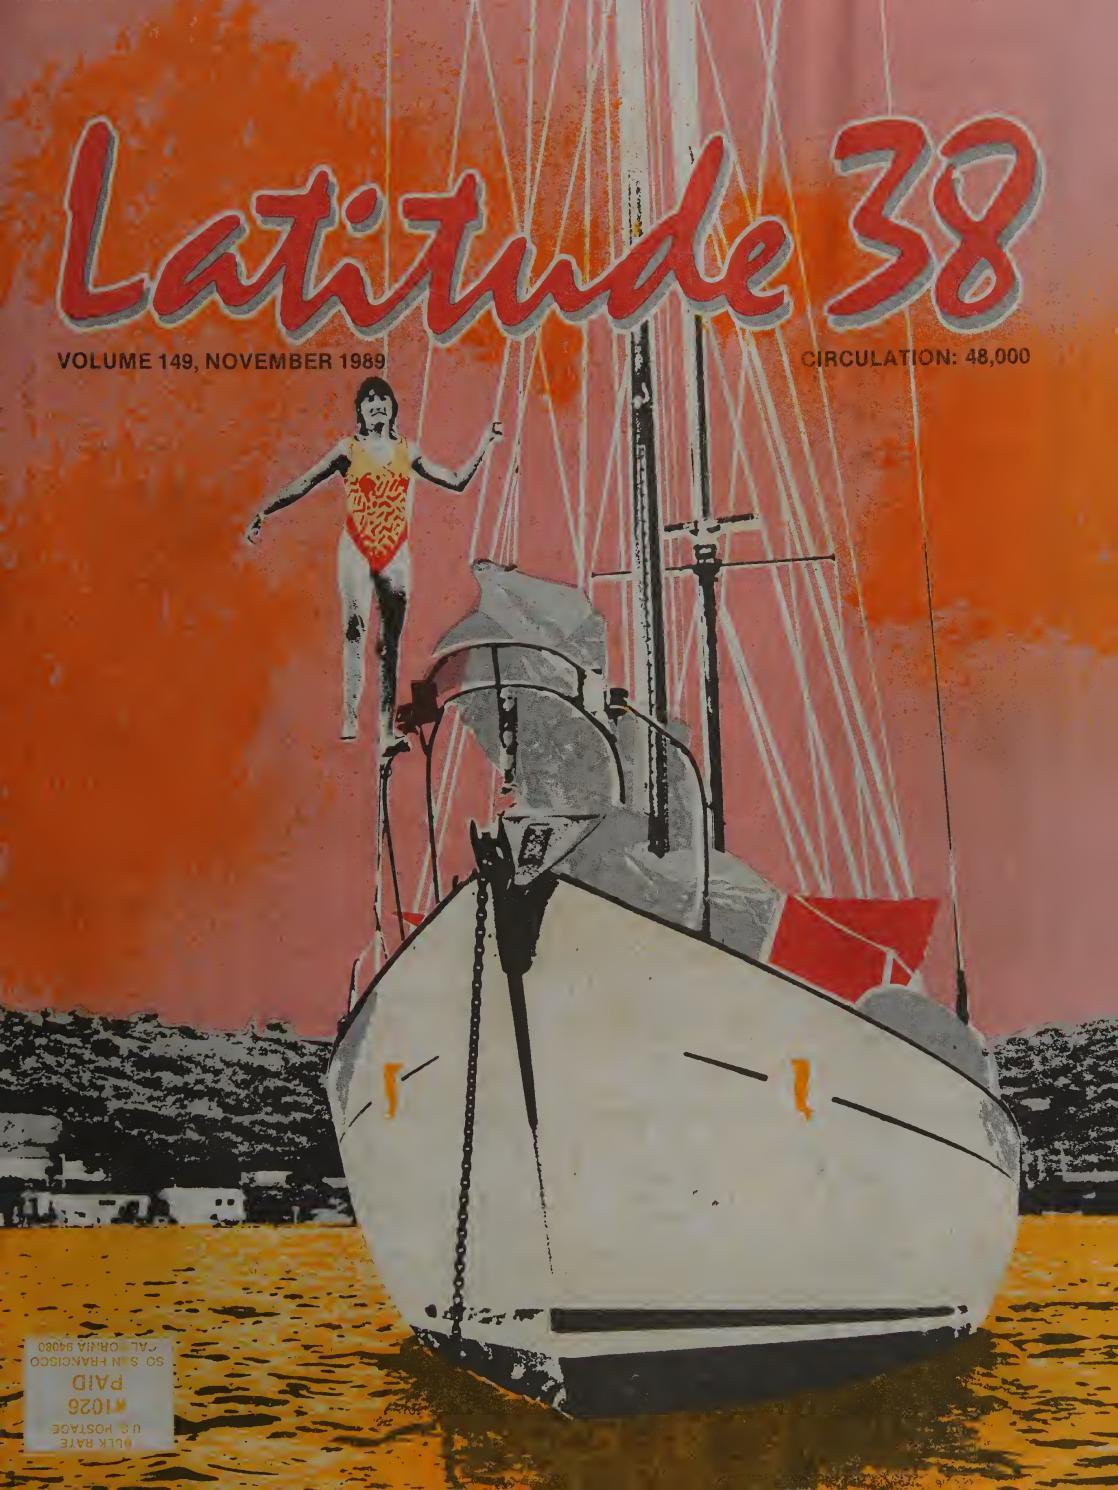 Latitude 38 November 1989 By Latitude 38 Media Llc Issuu